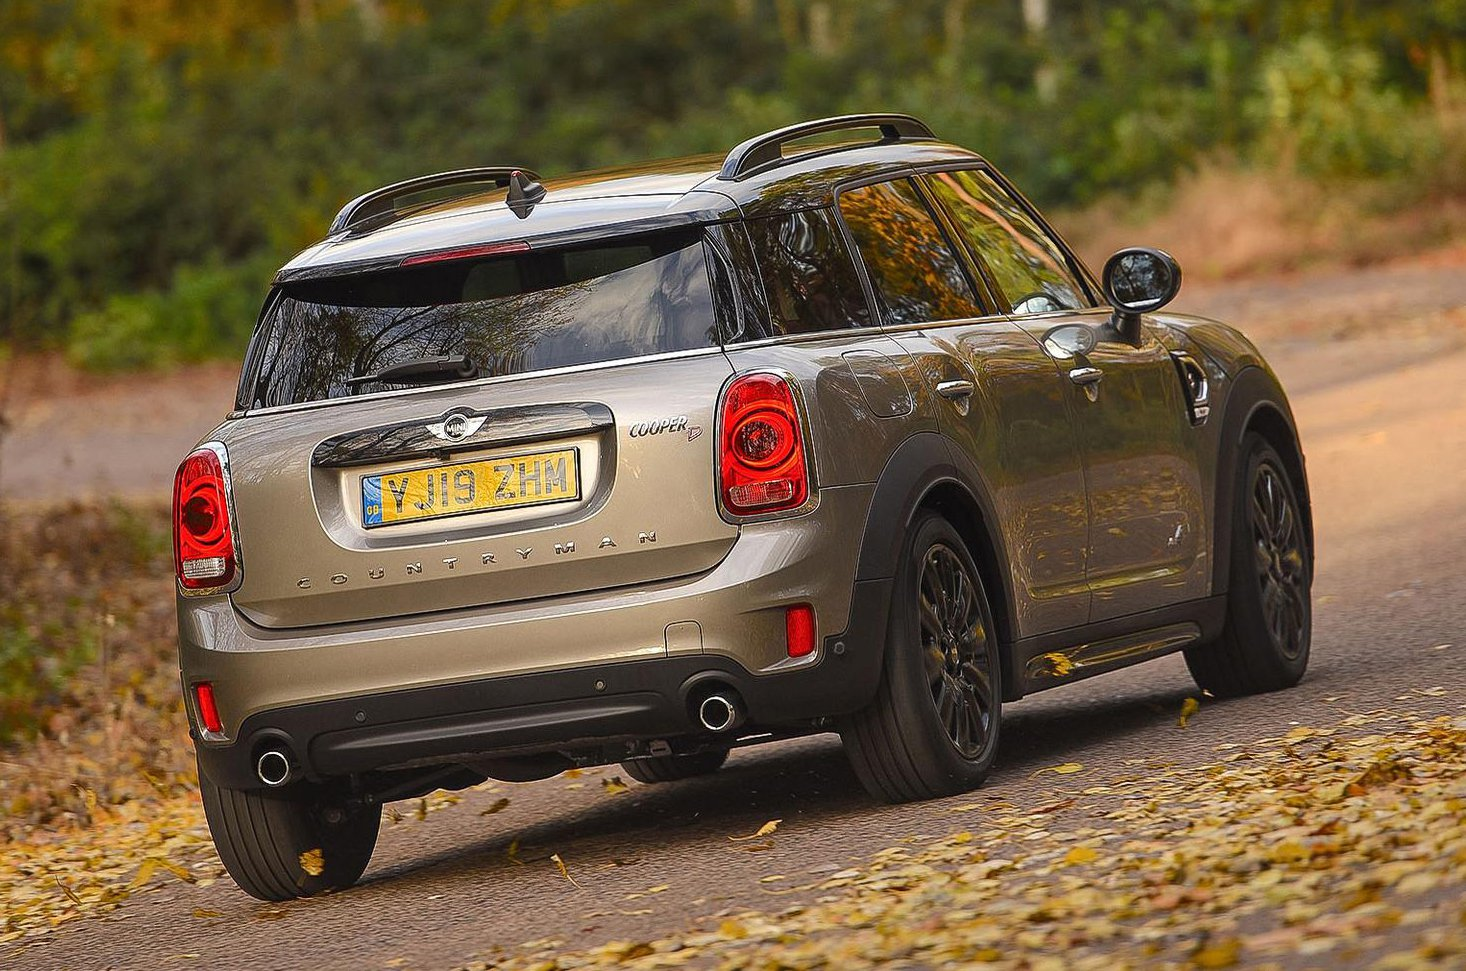 Mini Countryman rear - 19 plate